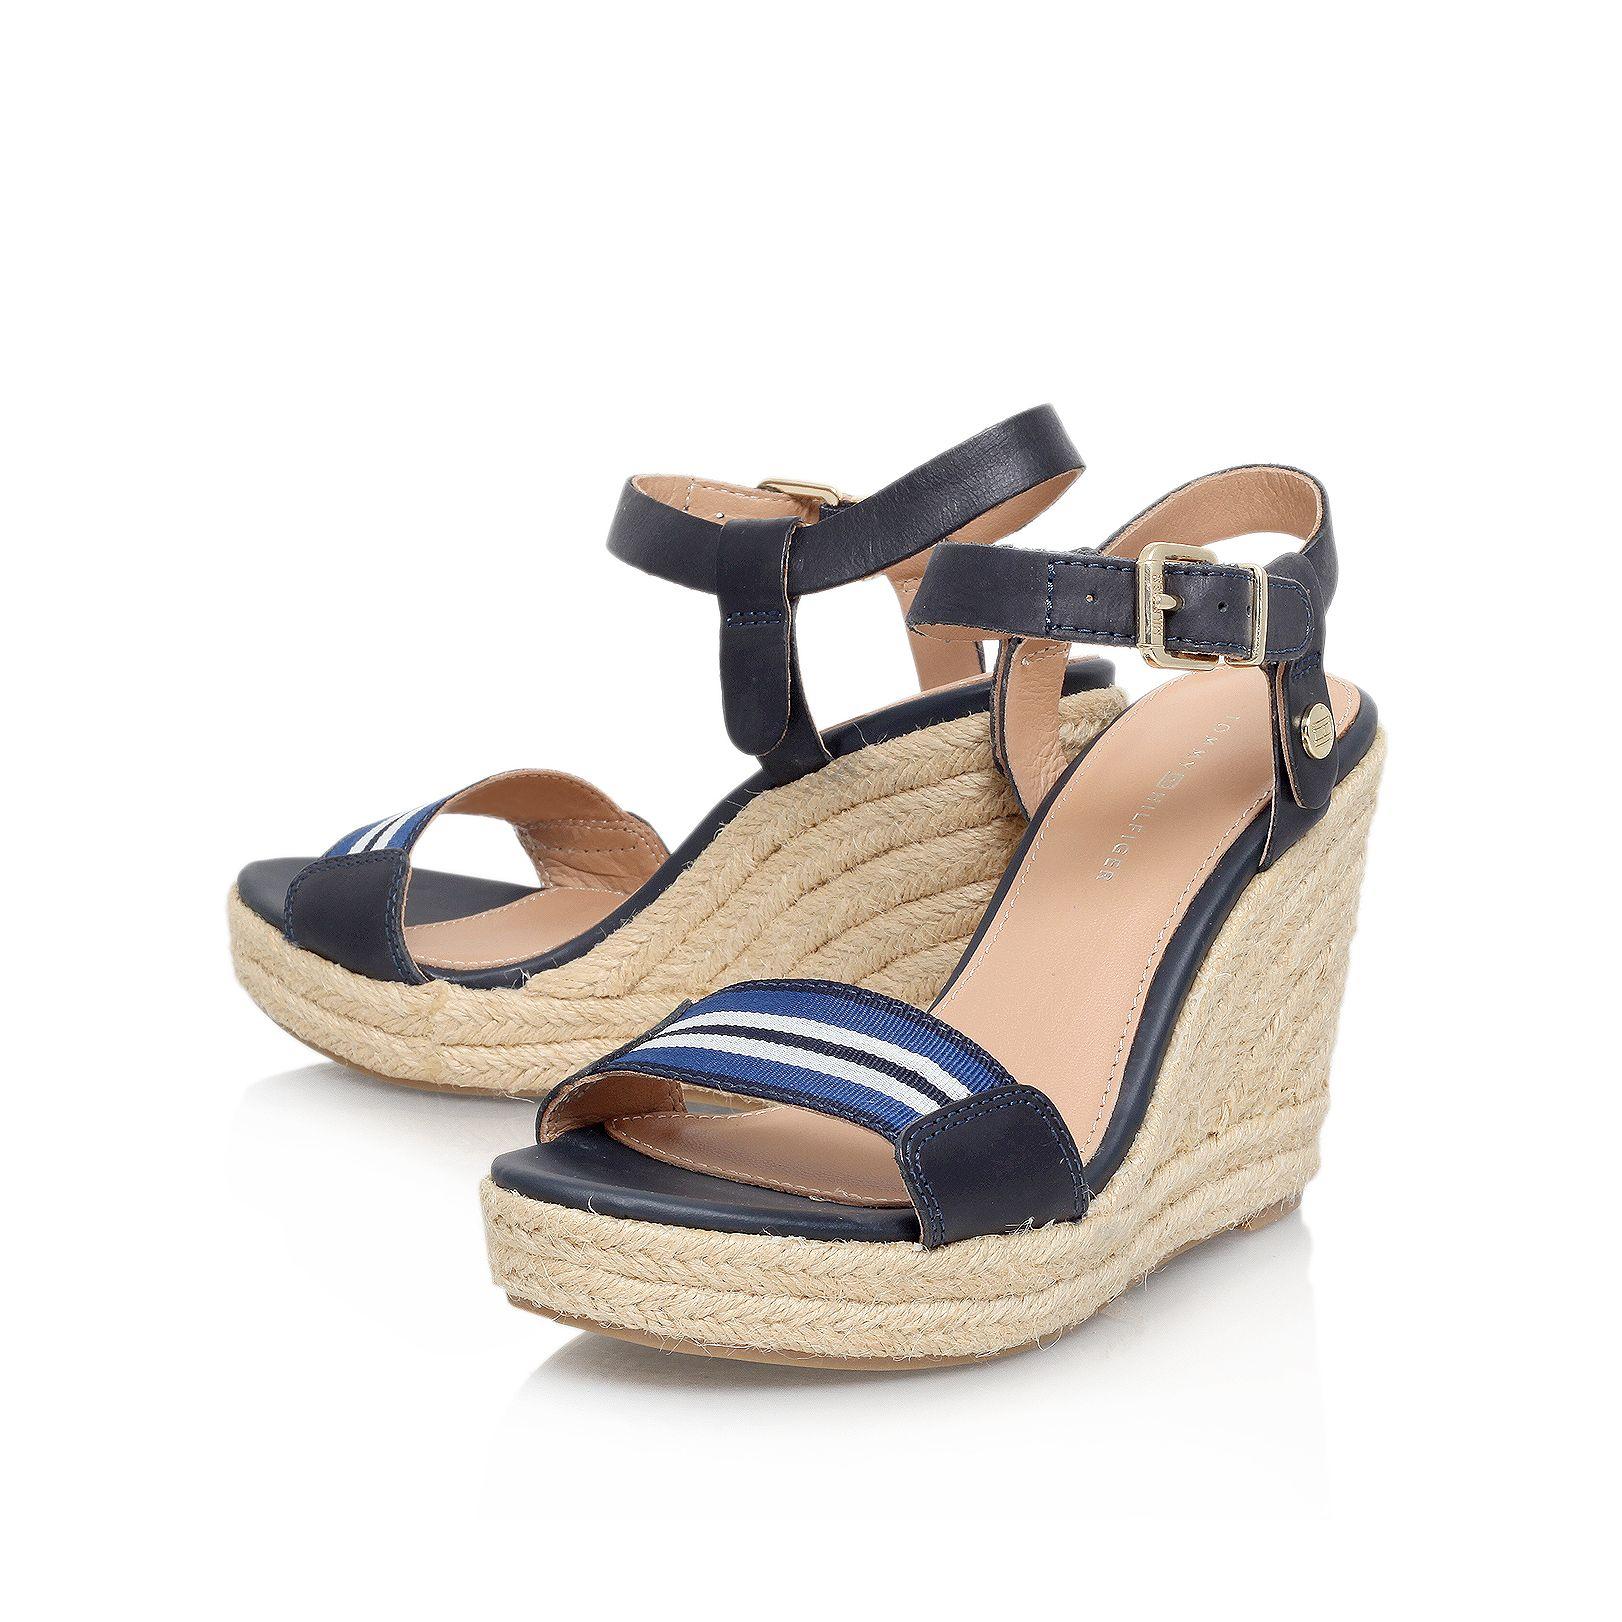 tommy hilfiger emery 87c high wedge heel sandals in blue lyst. Black Bedroom Furniture Sets. Home Design Ideas